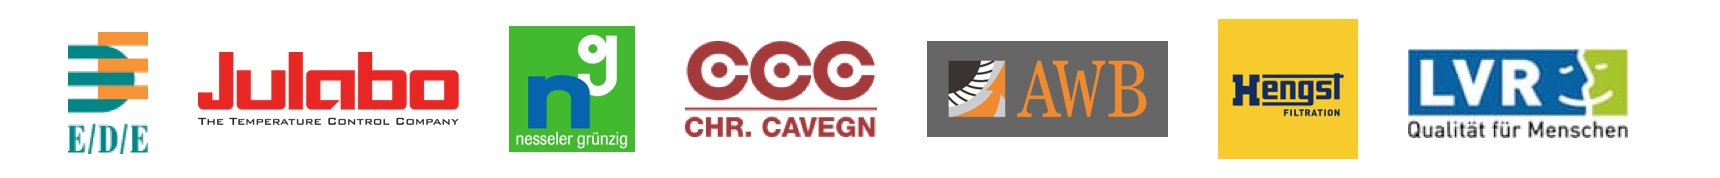 logos_wettbewerb